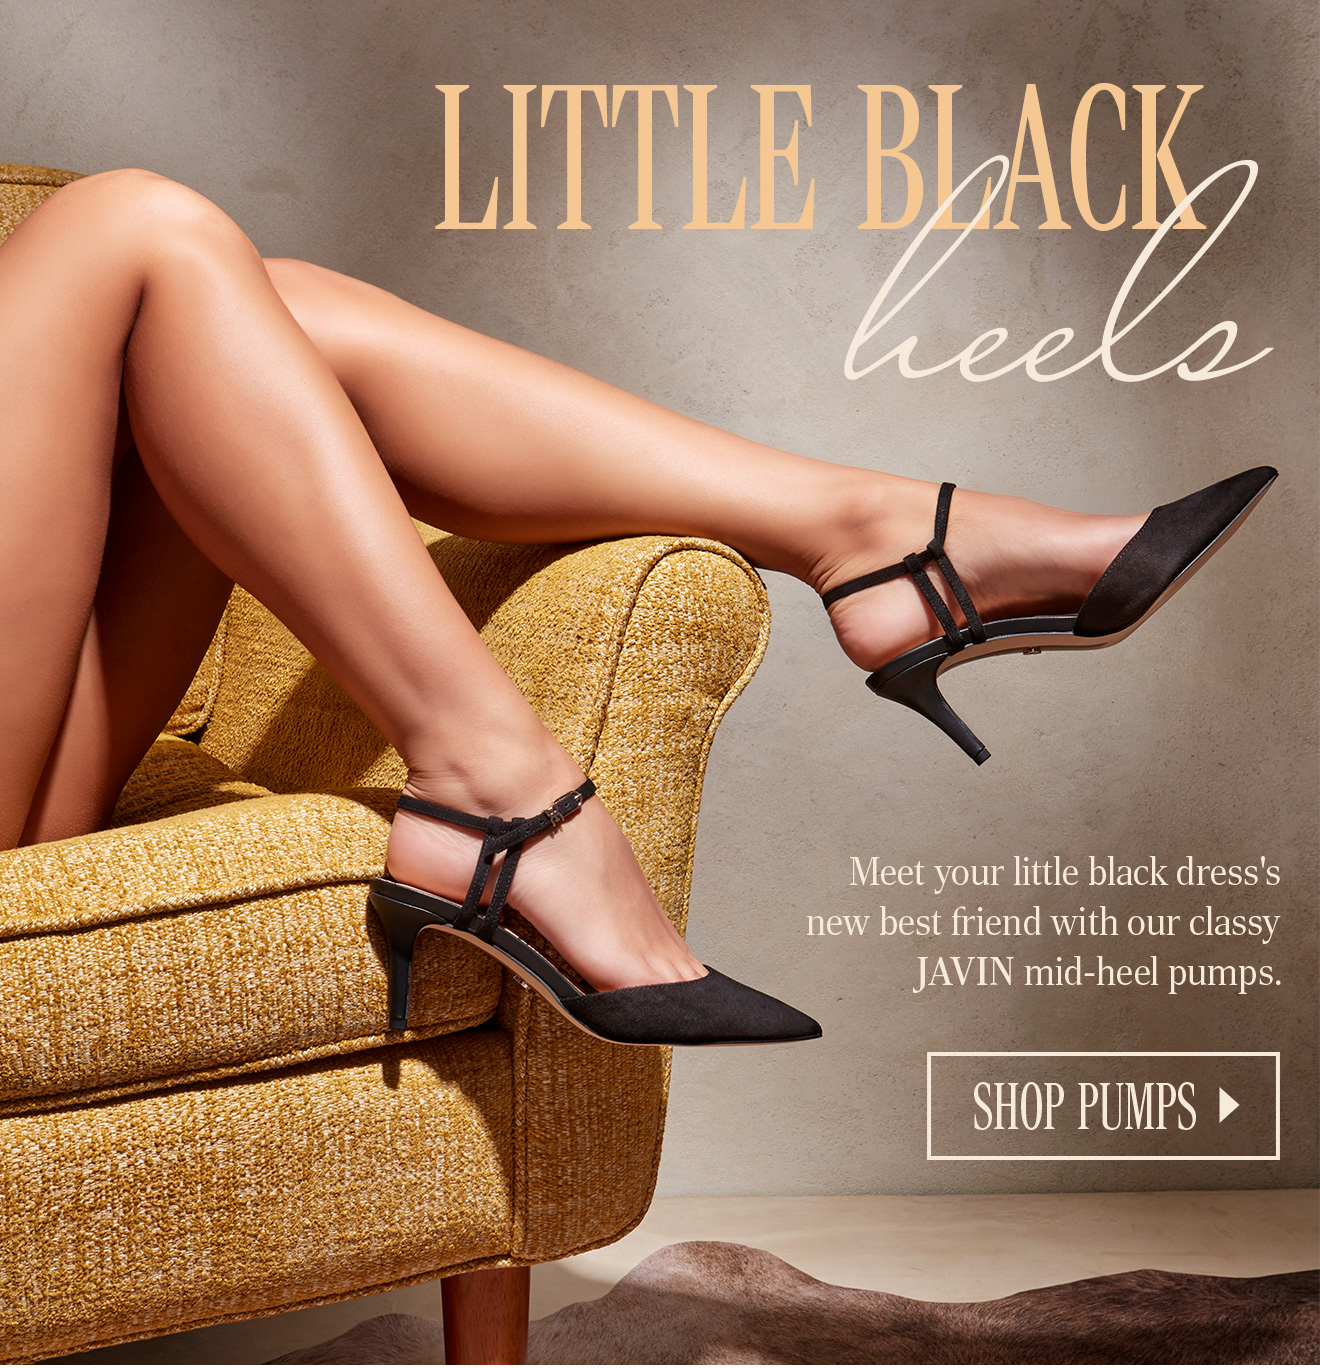 LITTLE BLAKC HEELS. Meet your little black dress'snew best friend with our classy JAVIN mid-heel pumps. SHOP PUMPS